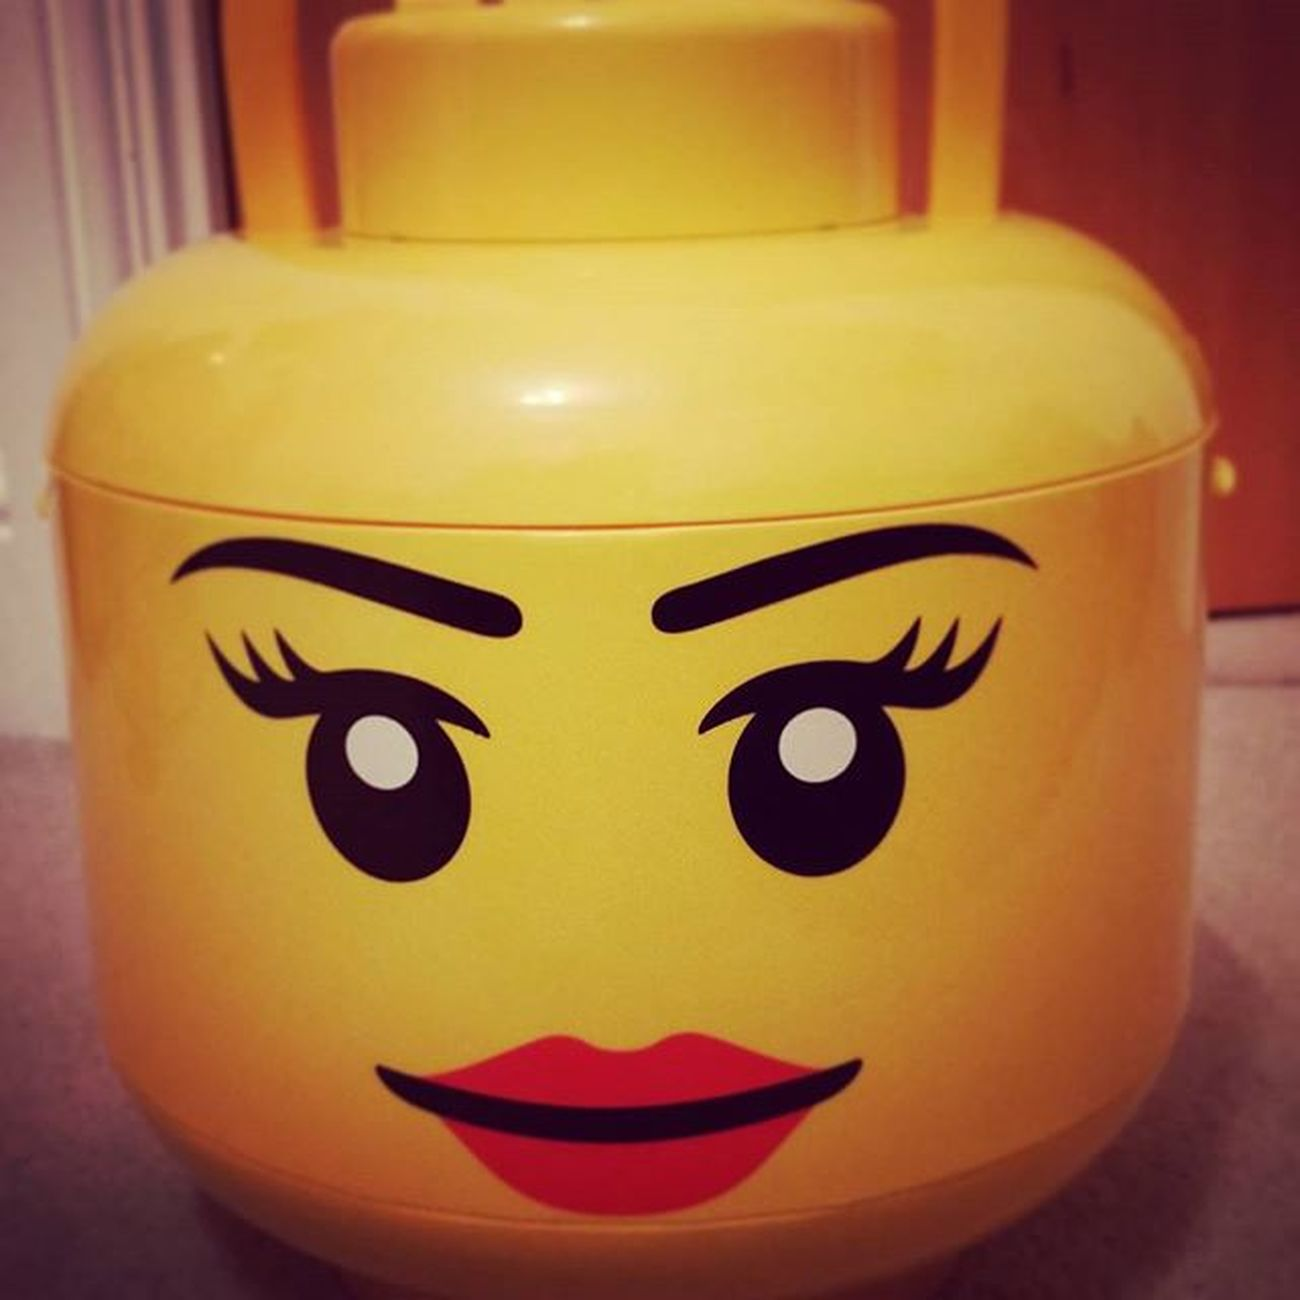 My lovely LEGO Sortandstore Sortandstorehead Legoigers Legolove LegoLover Legoigers Afol Android Shotonandroid Shotonsamsung